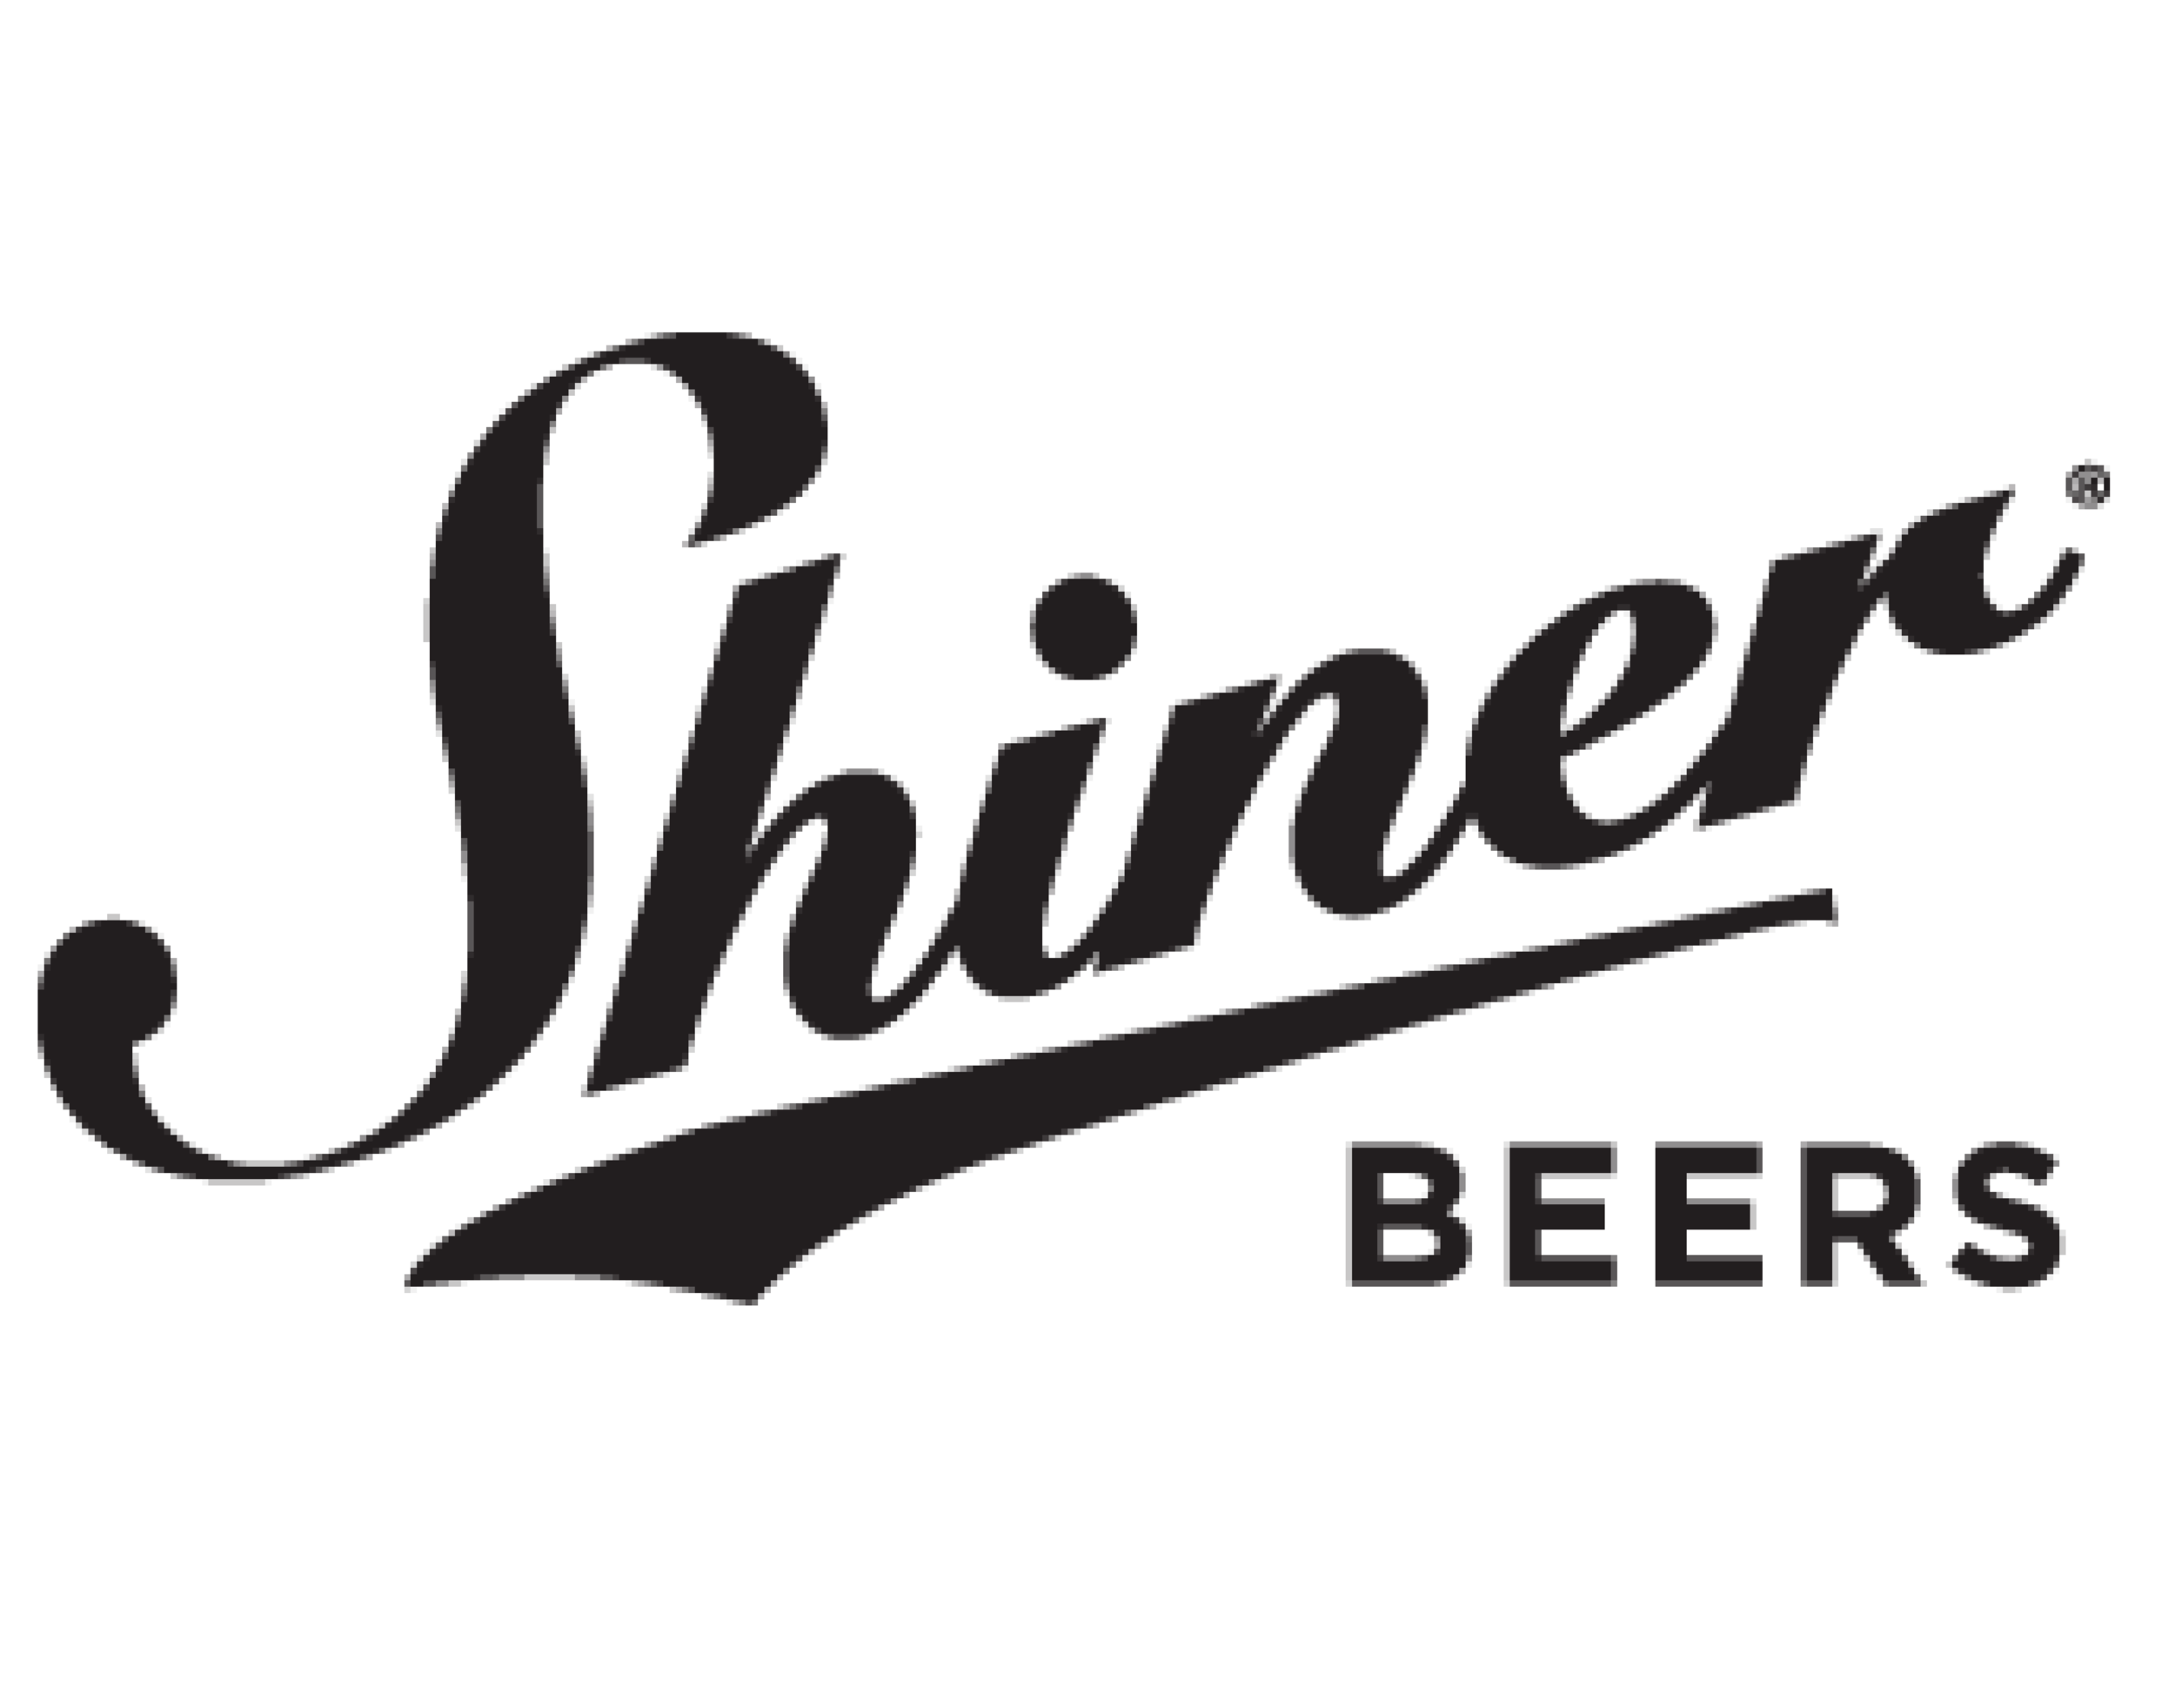 Shiner logo. Links to Shiner website.